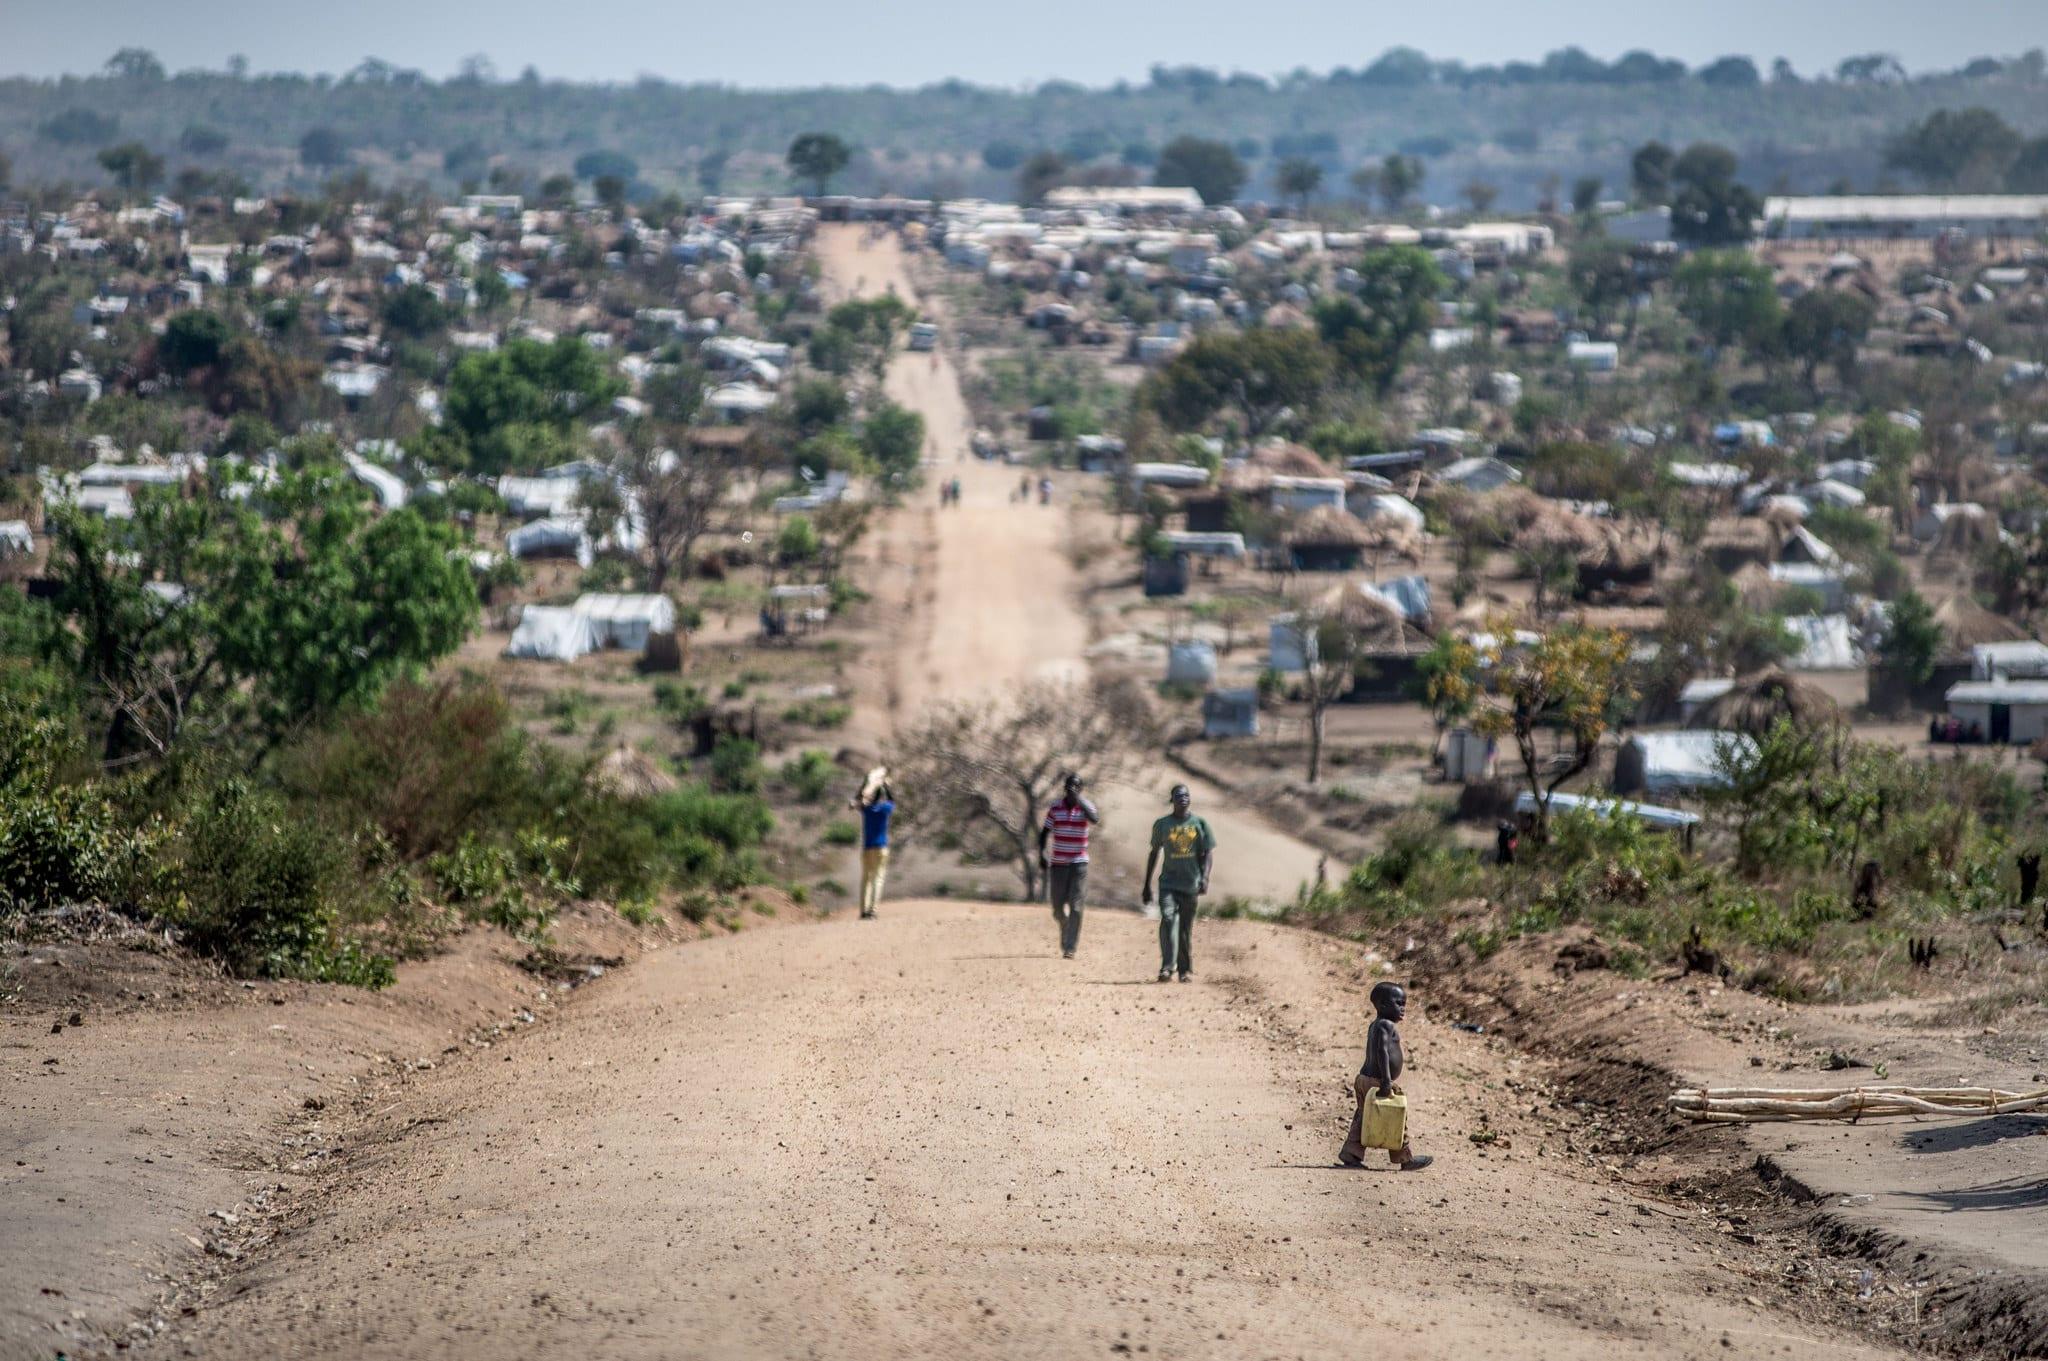 Bidibidi refugee settlement (photo courtesy of Creative Commons)